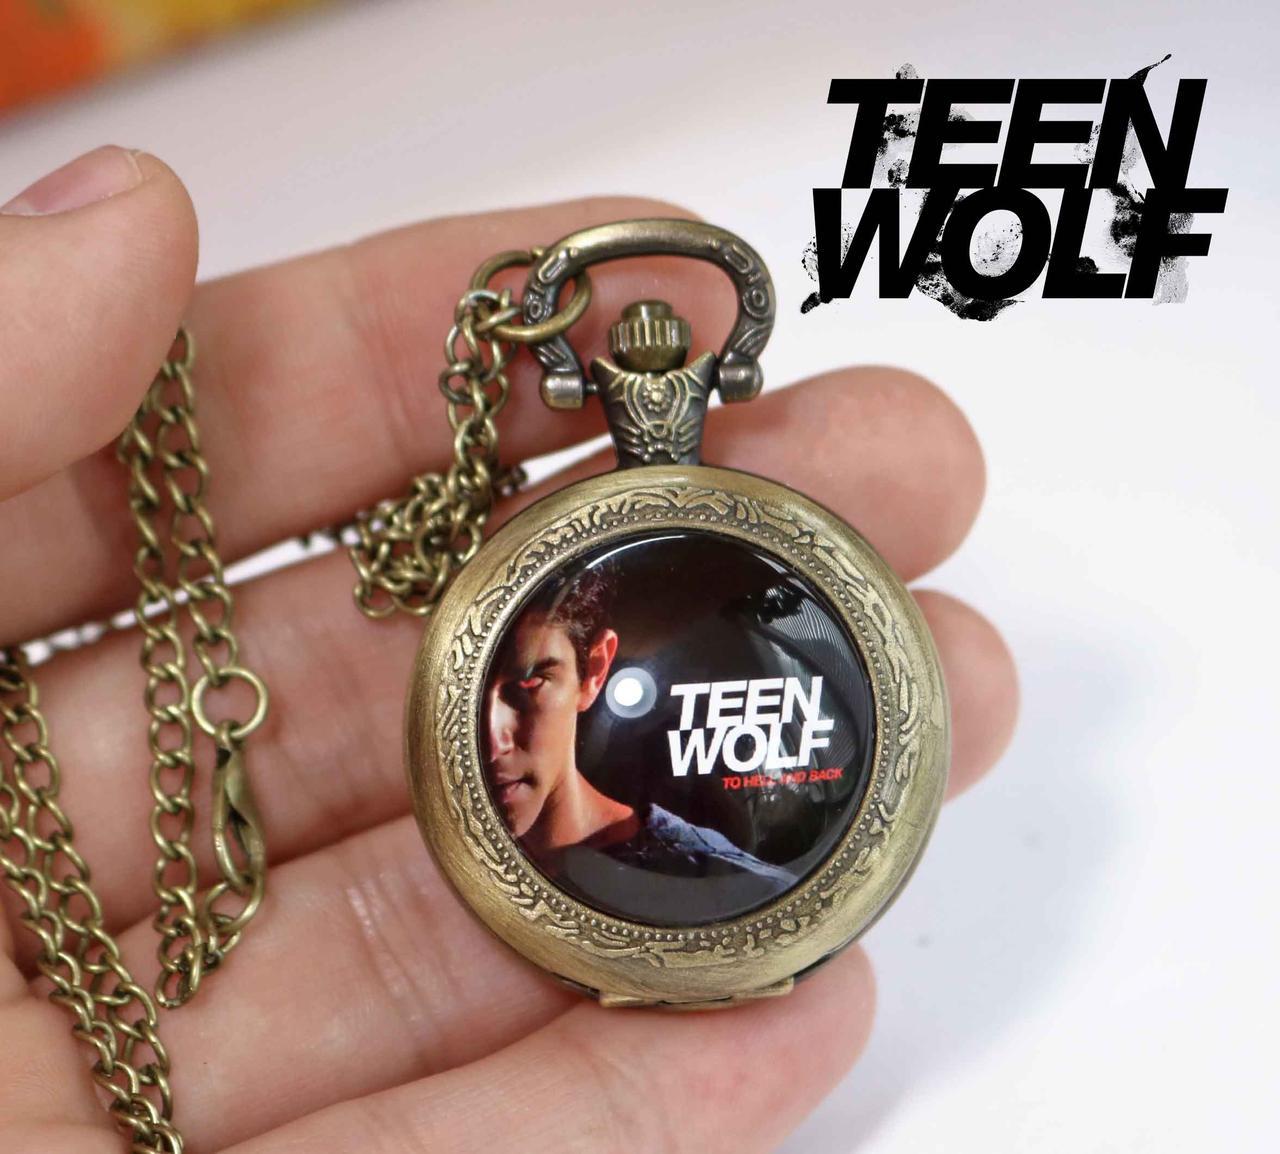 Карманные часы Волчонок / Teen Wolf